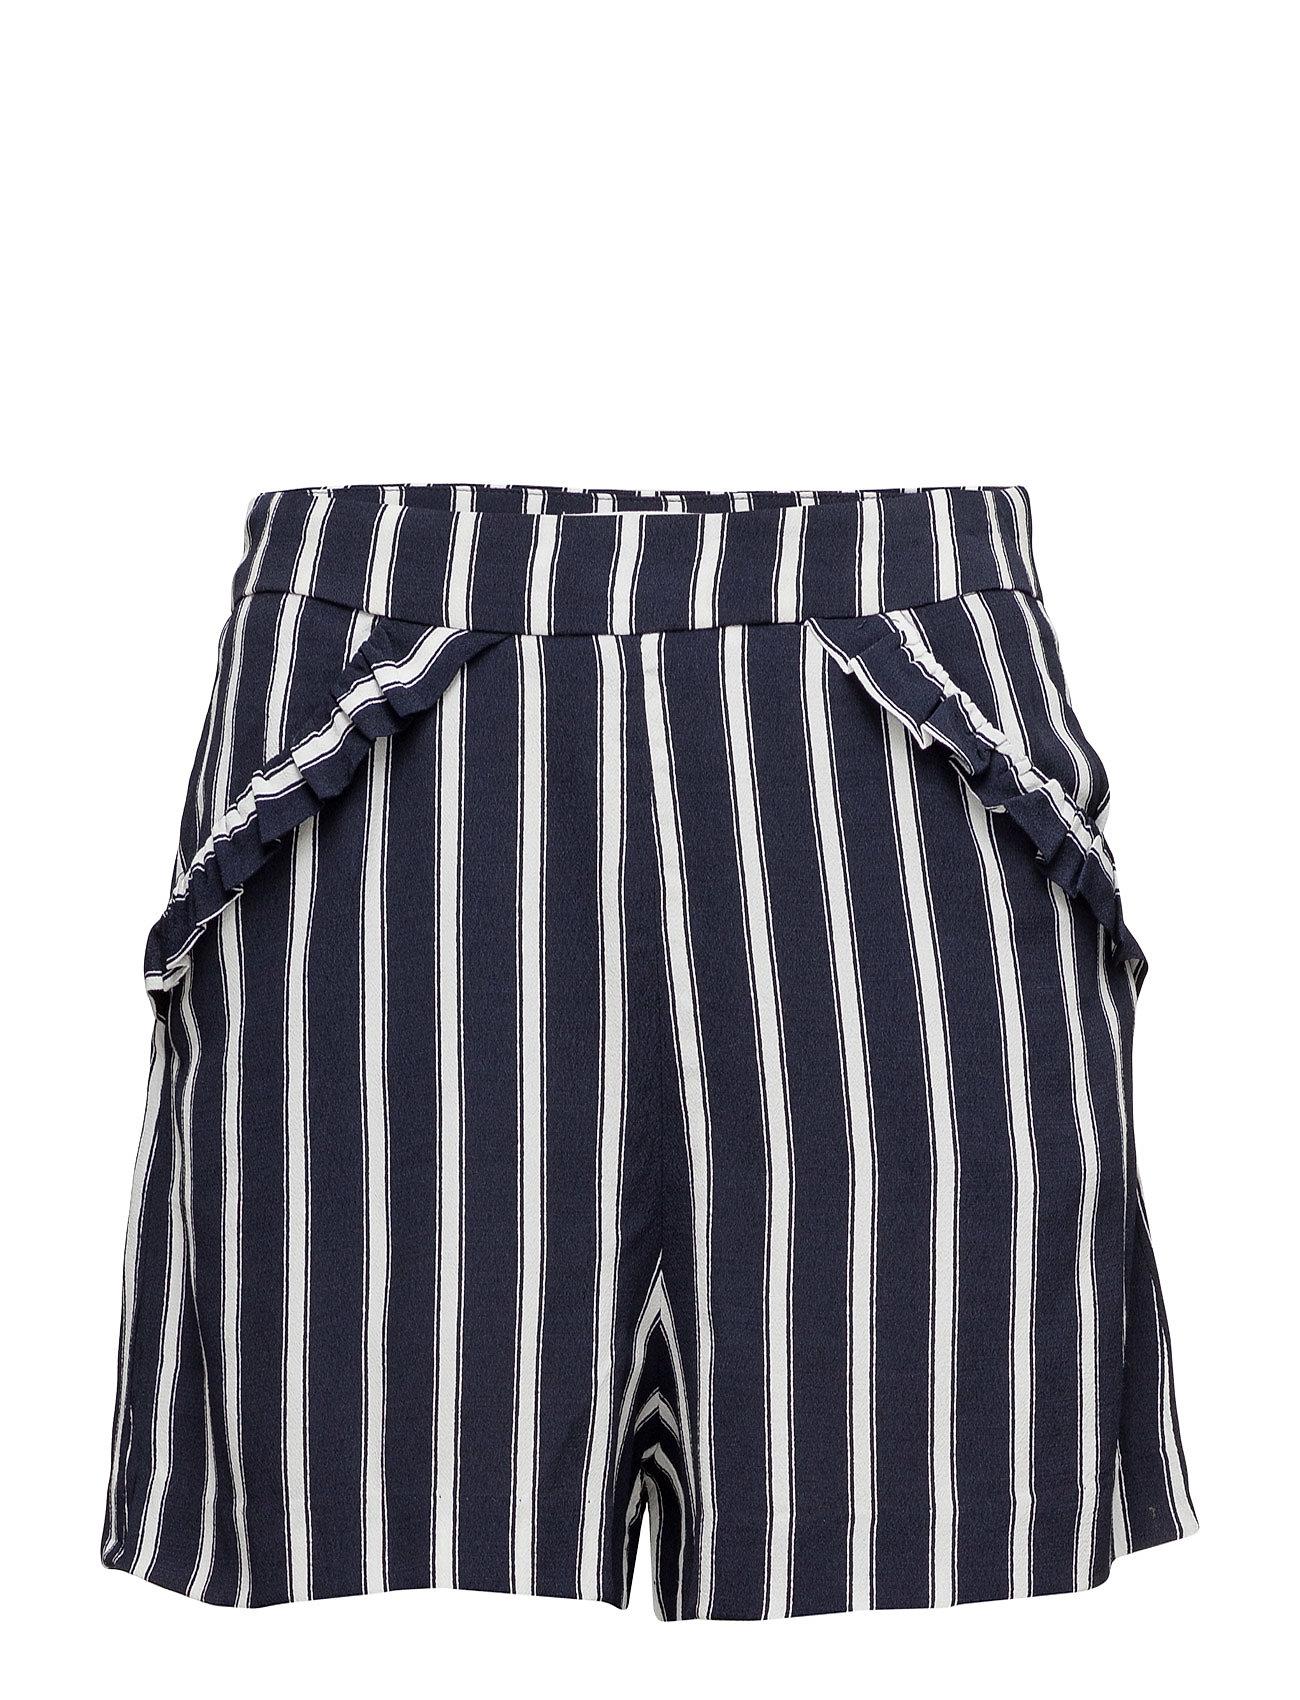 Printed Flowy Shorts Mango  til Damer i Navy blå